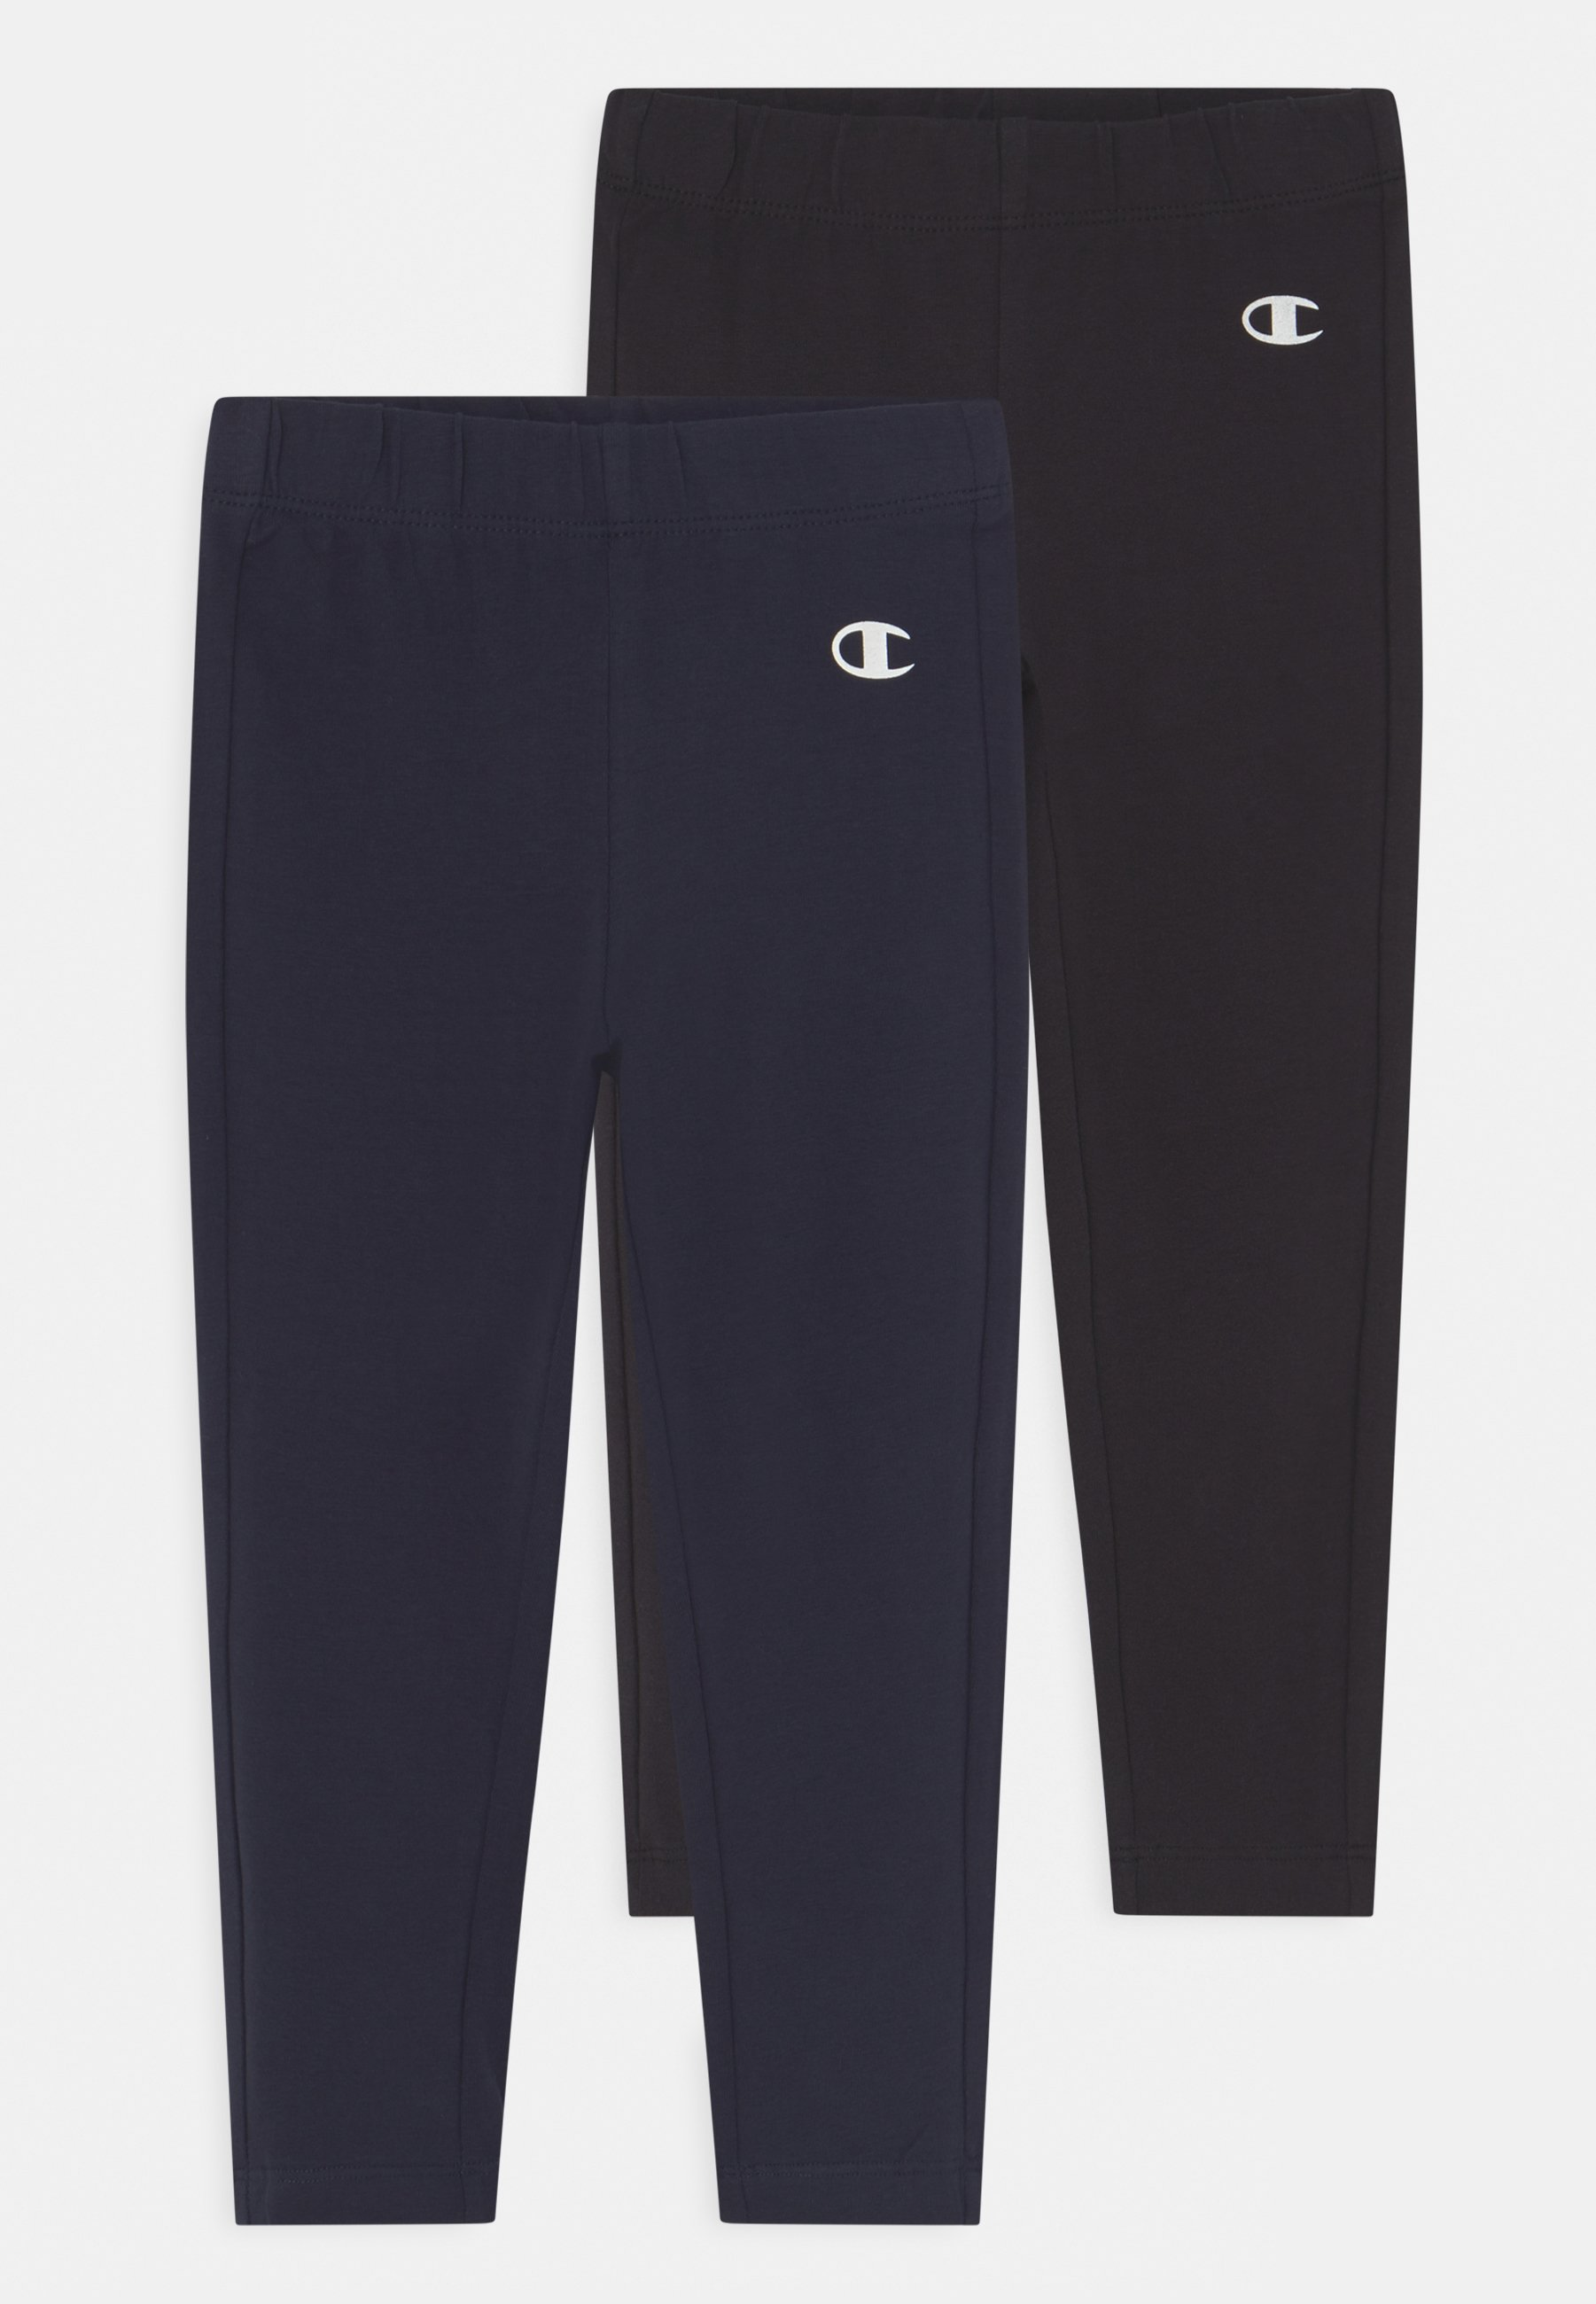 Kids AMERICAN CLASSICS PANTS 2 PACK UNISEX - Leggings - Trousers